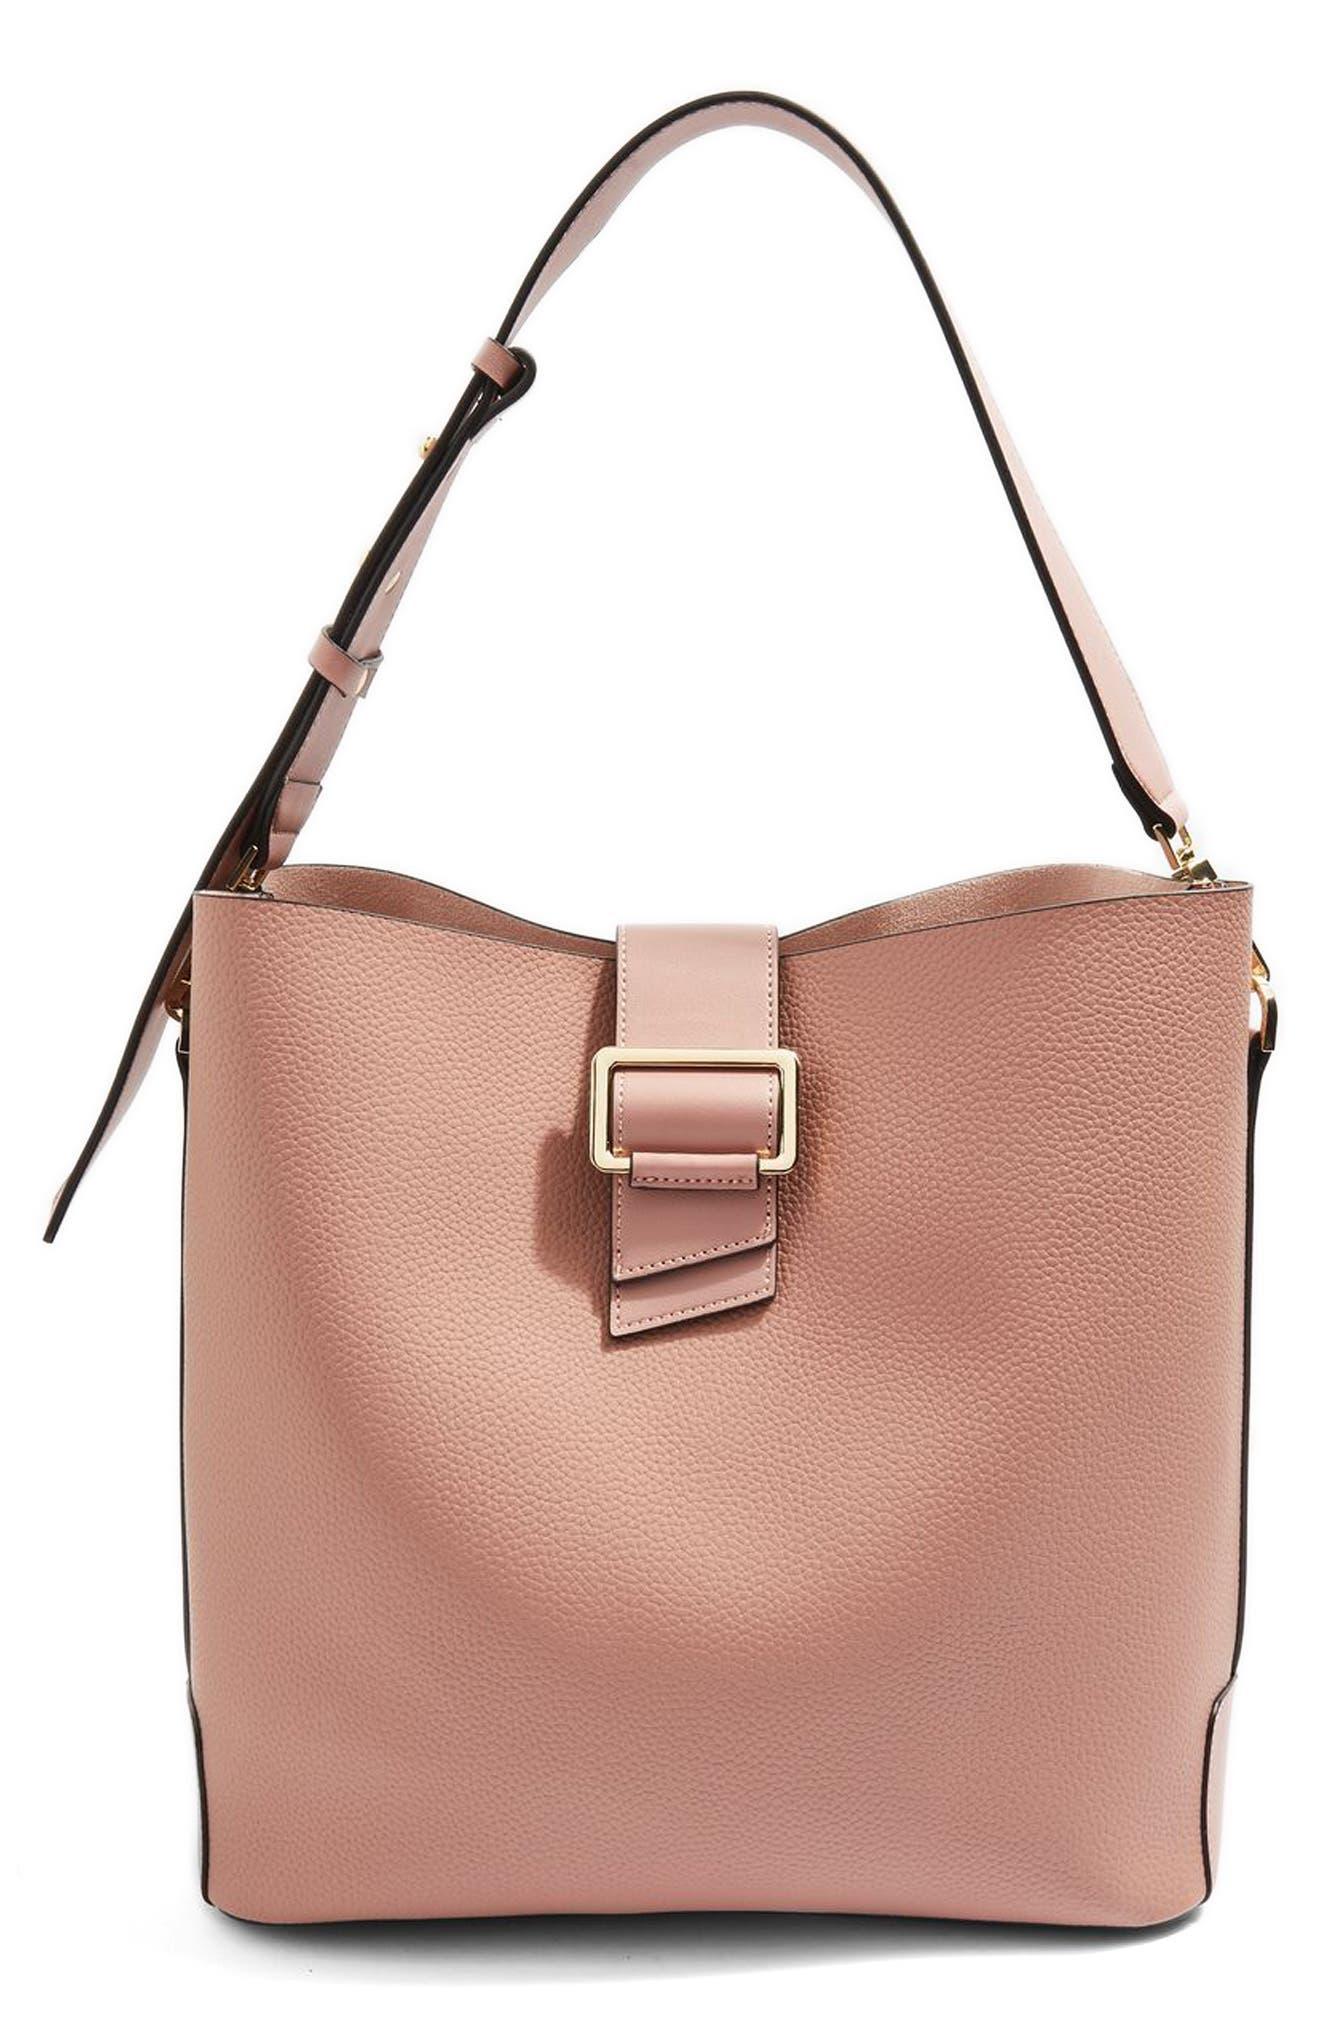 Seema Buckle Hobo Bag,                         Main,                         color, Pink Multi